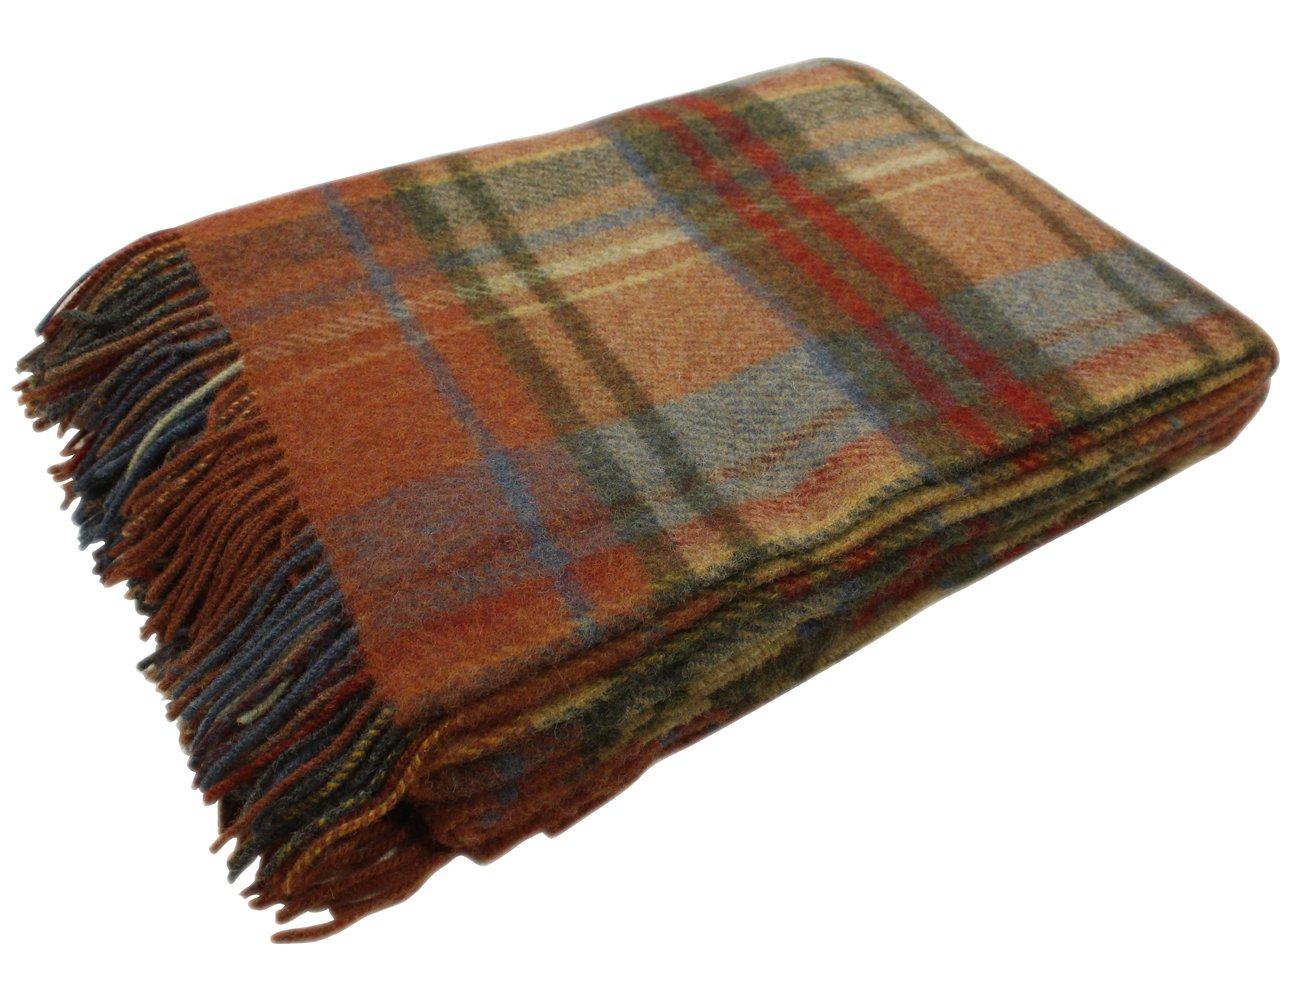 Wool Throw Blanket 54'' x 72'' Orange Plaid Irish Made